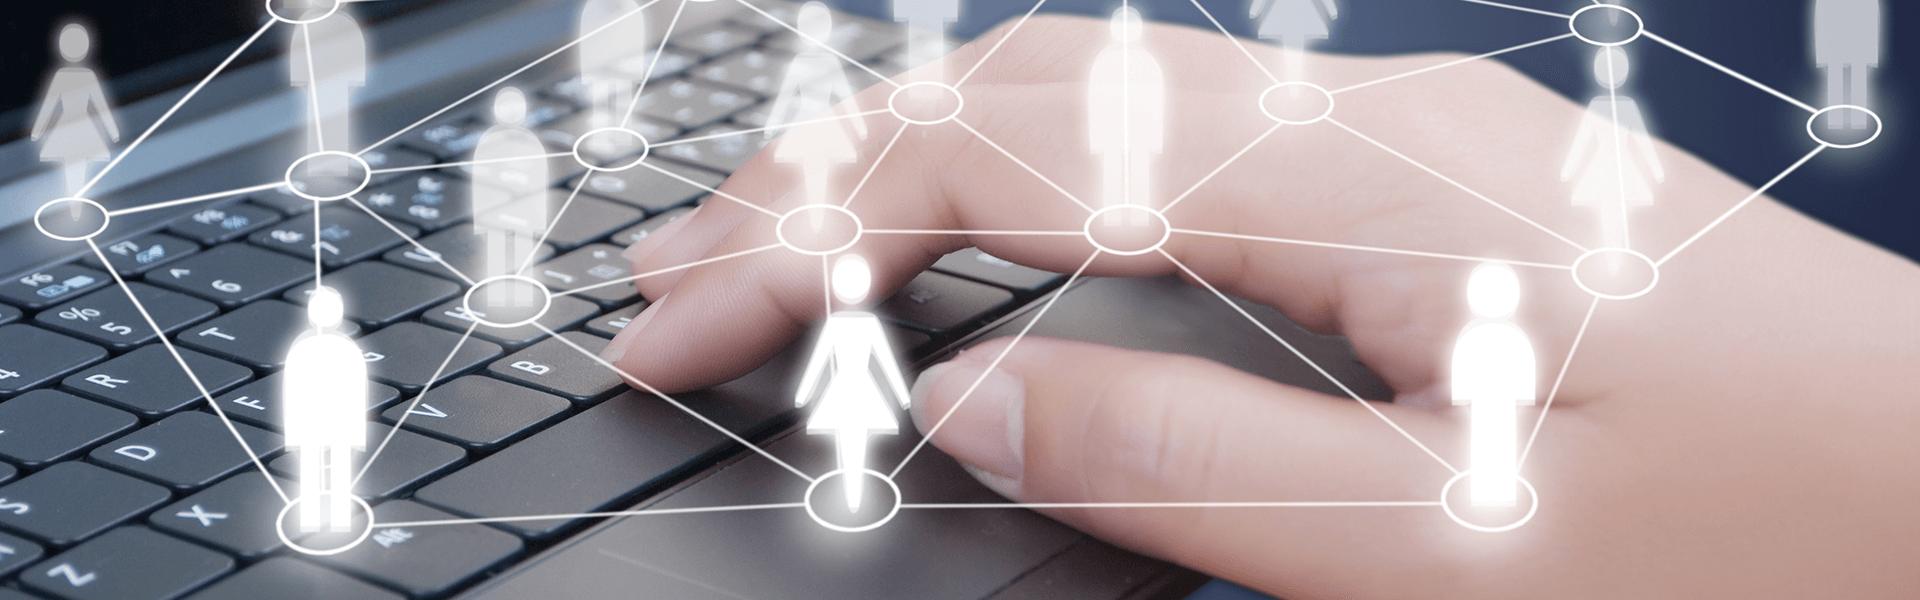 Data sharing concept